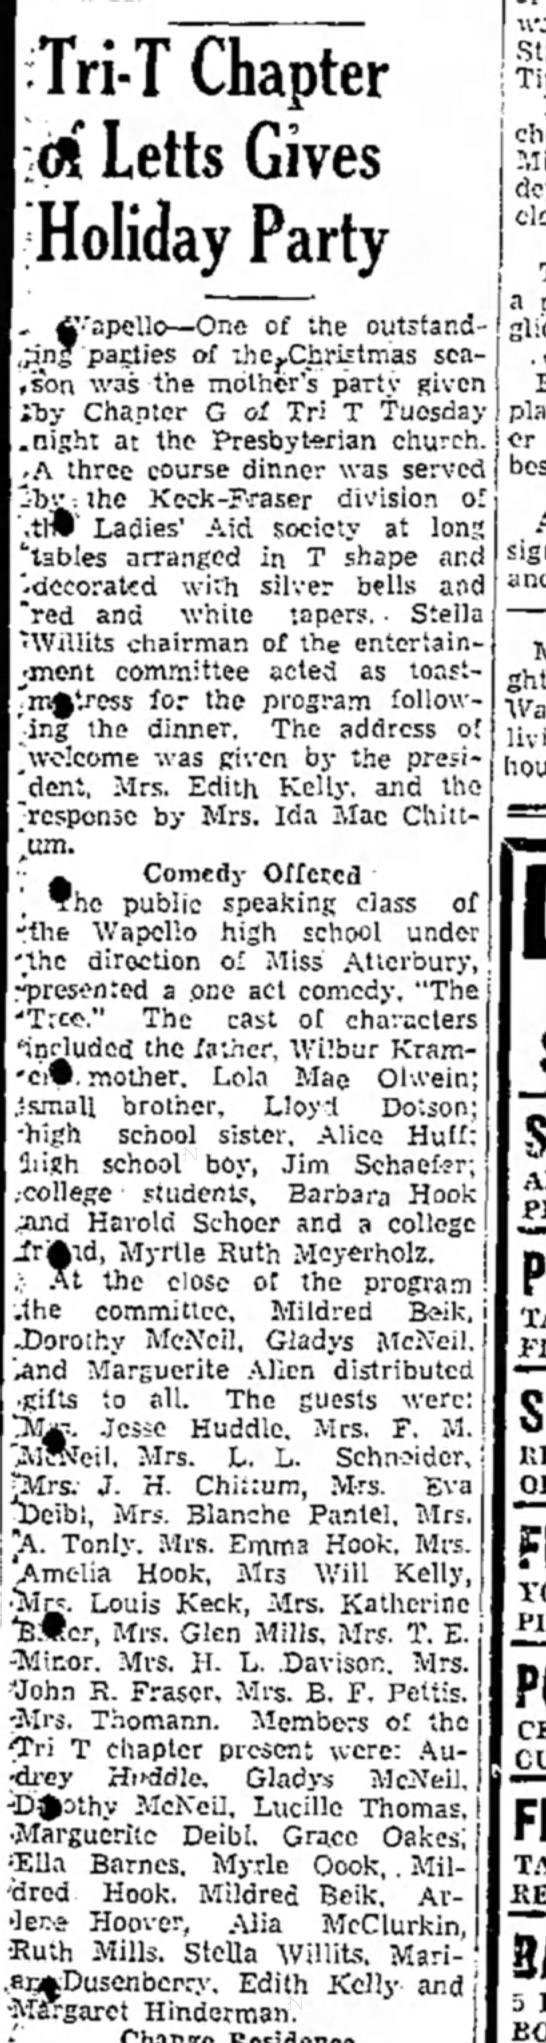 1942 Wapello The Muscatine News-Tribune 12.18.1941